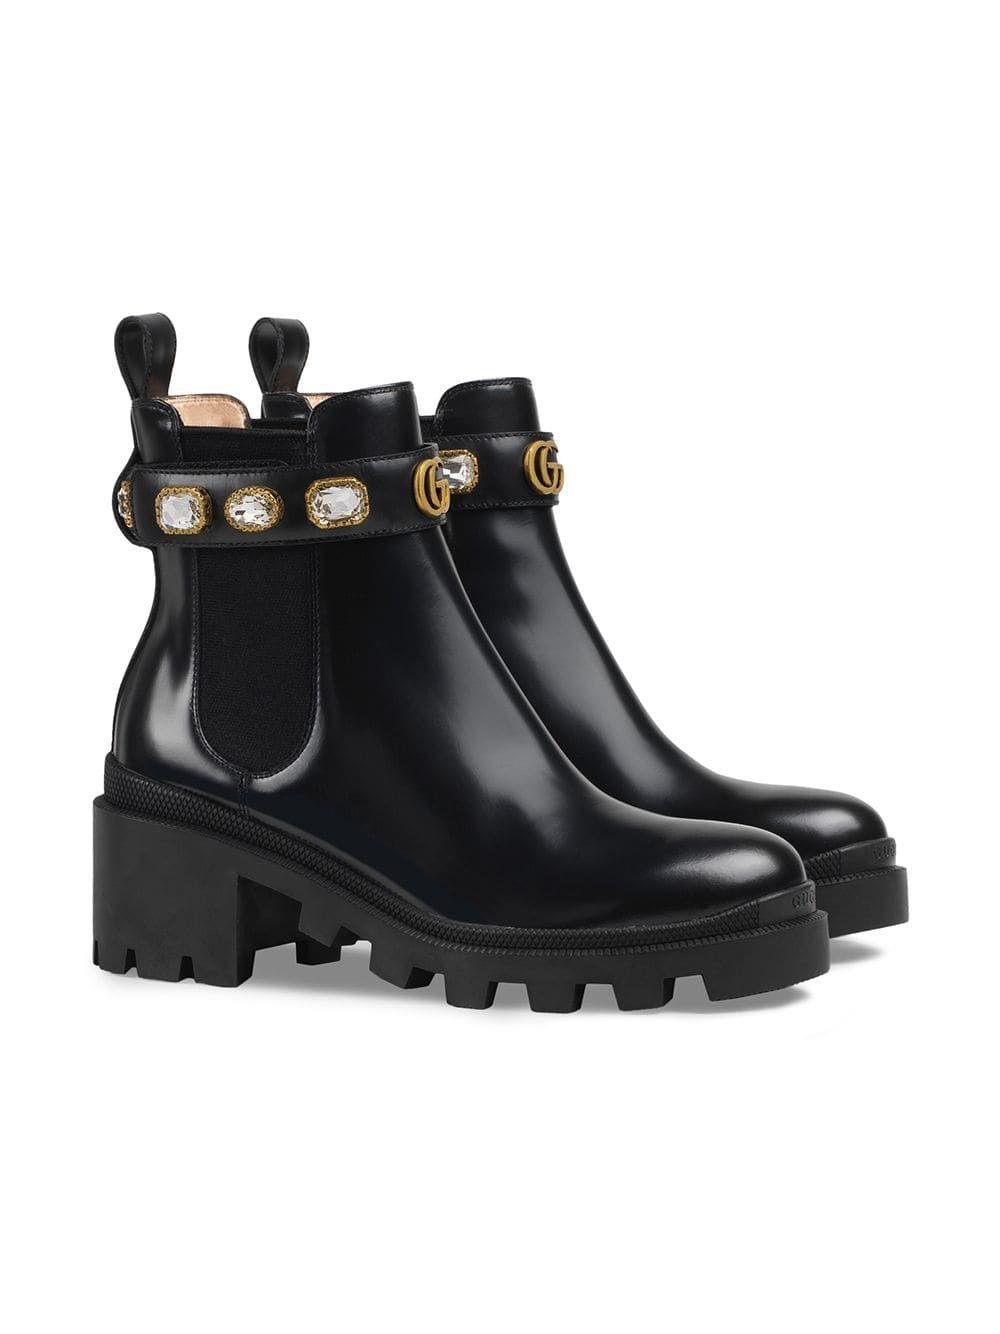 c153d511e Gucci Botines Con Correa in 2019 | Cute stuff I want | Leather ankle ...